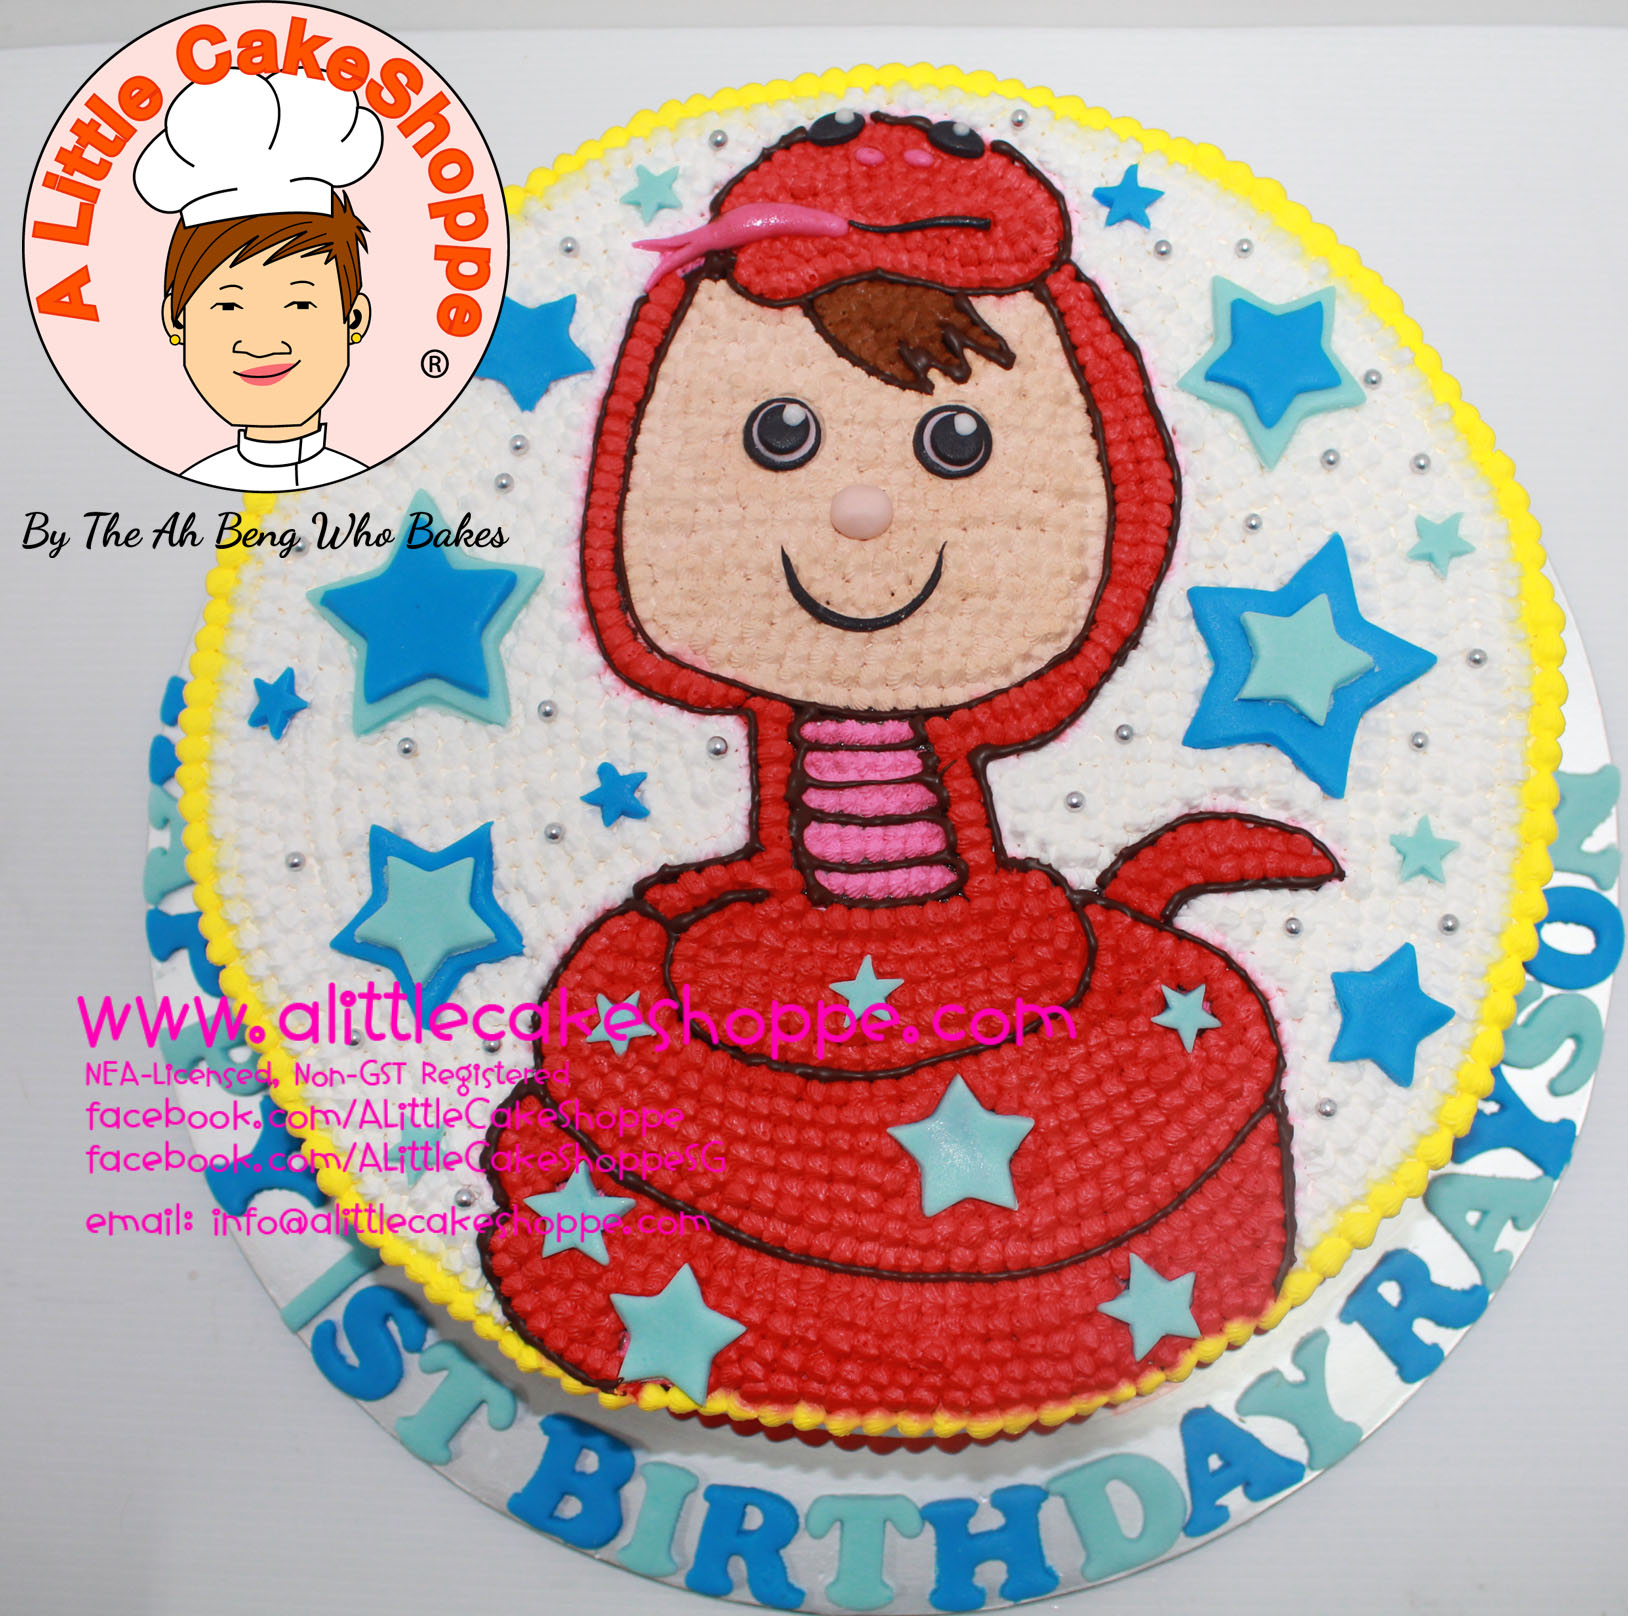 Best Customised Cake Singapore custom cake 2D 3D birthday cake cupcakes wedding corporate events anniversary fondant fresh cream buttercream cakes alittlecakeshoppe compliments review singapore bakers SG cakeshop ah beng who bakes animal cake